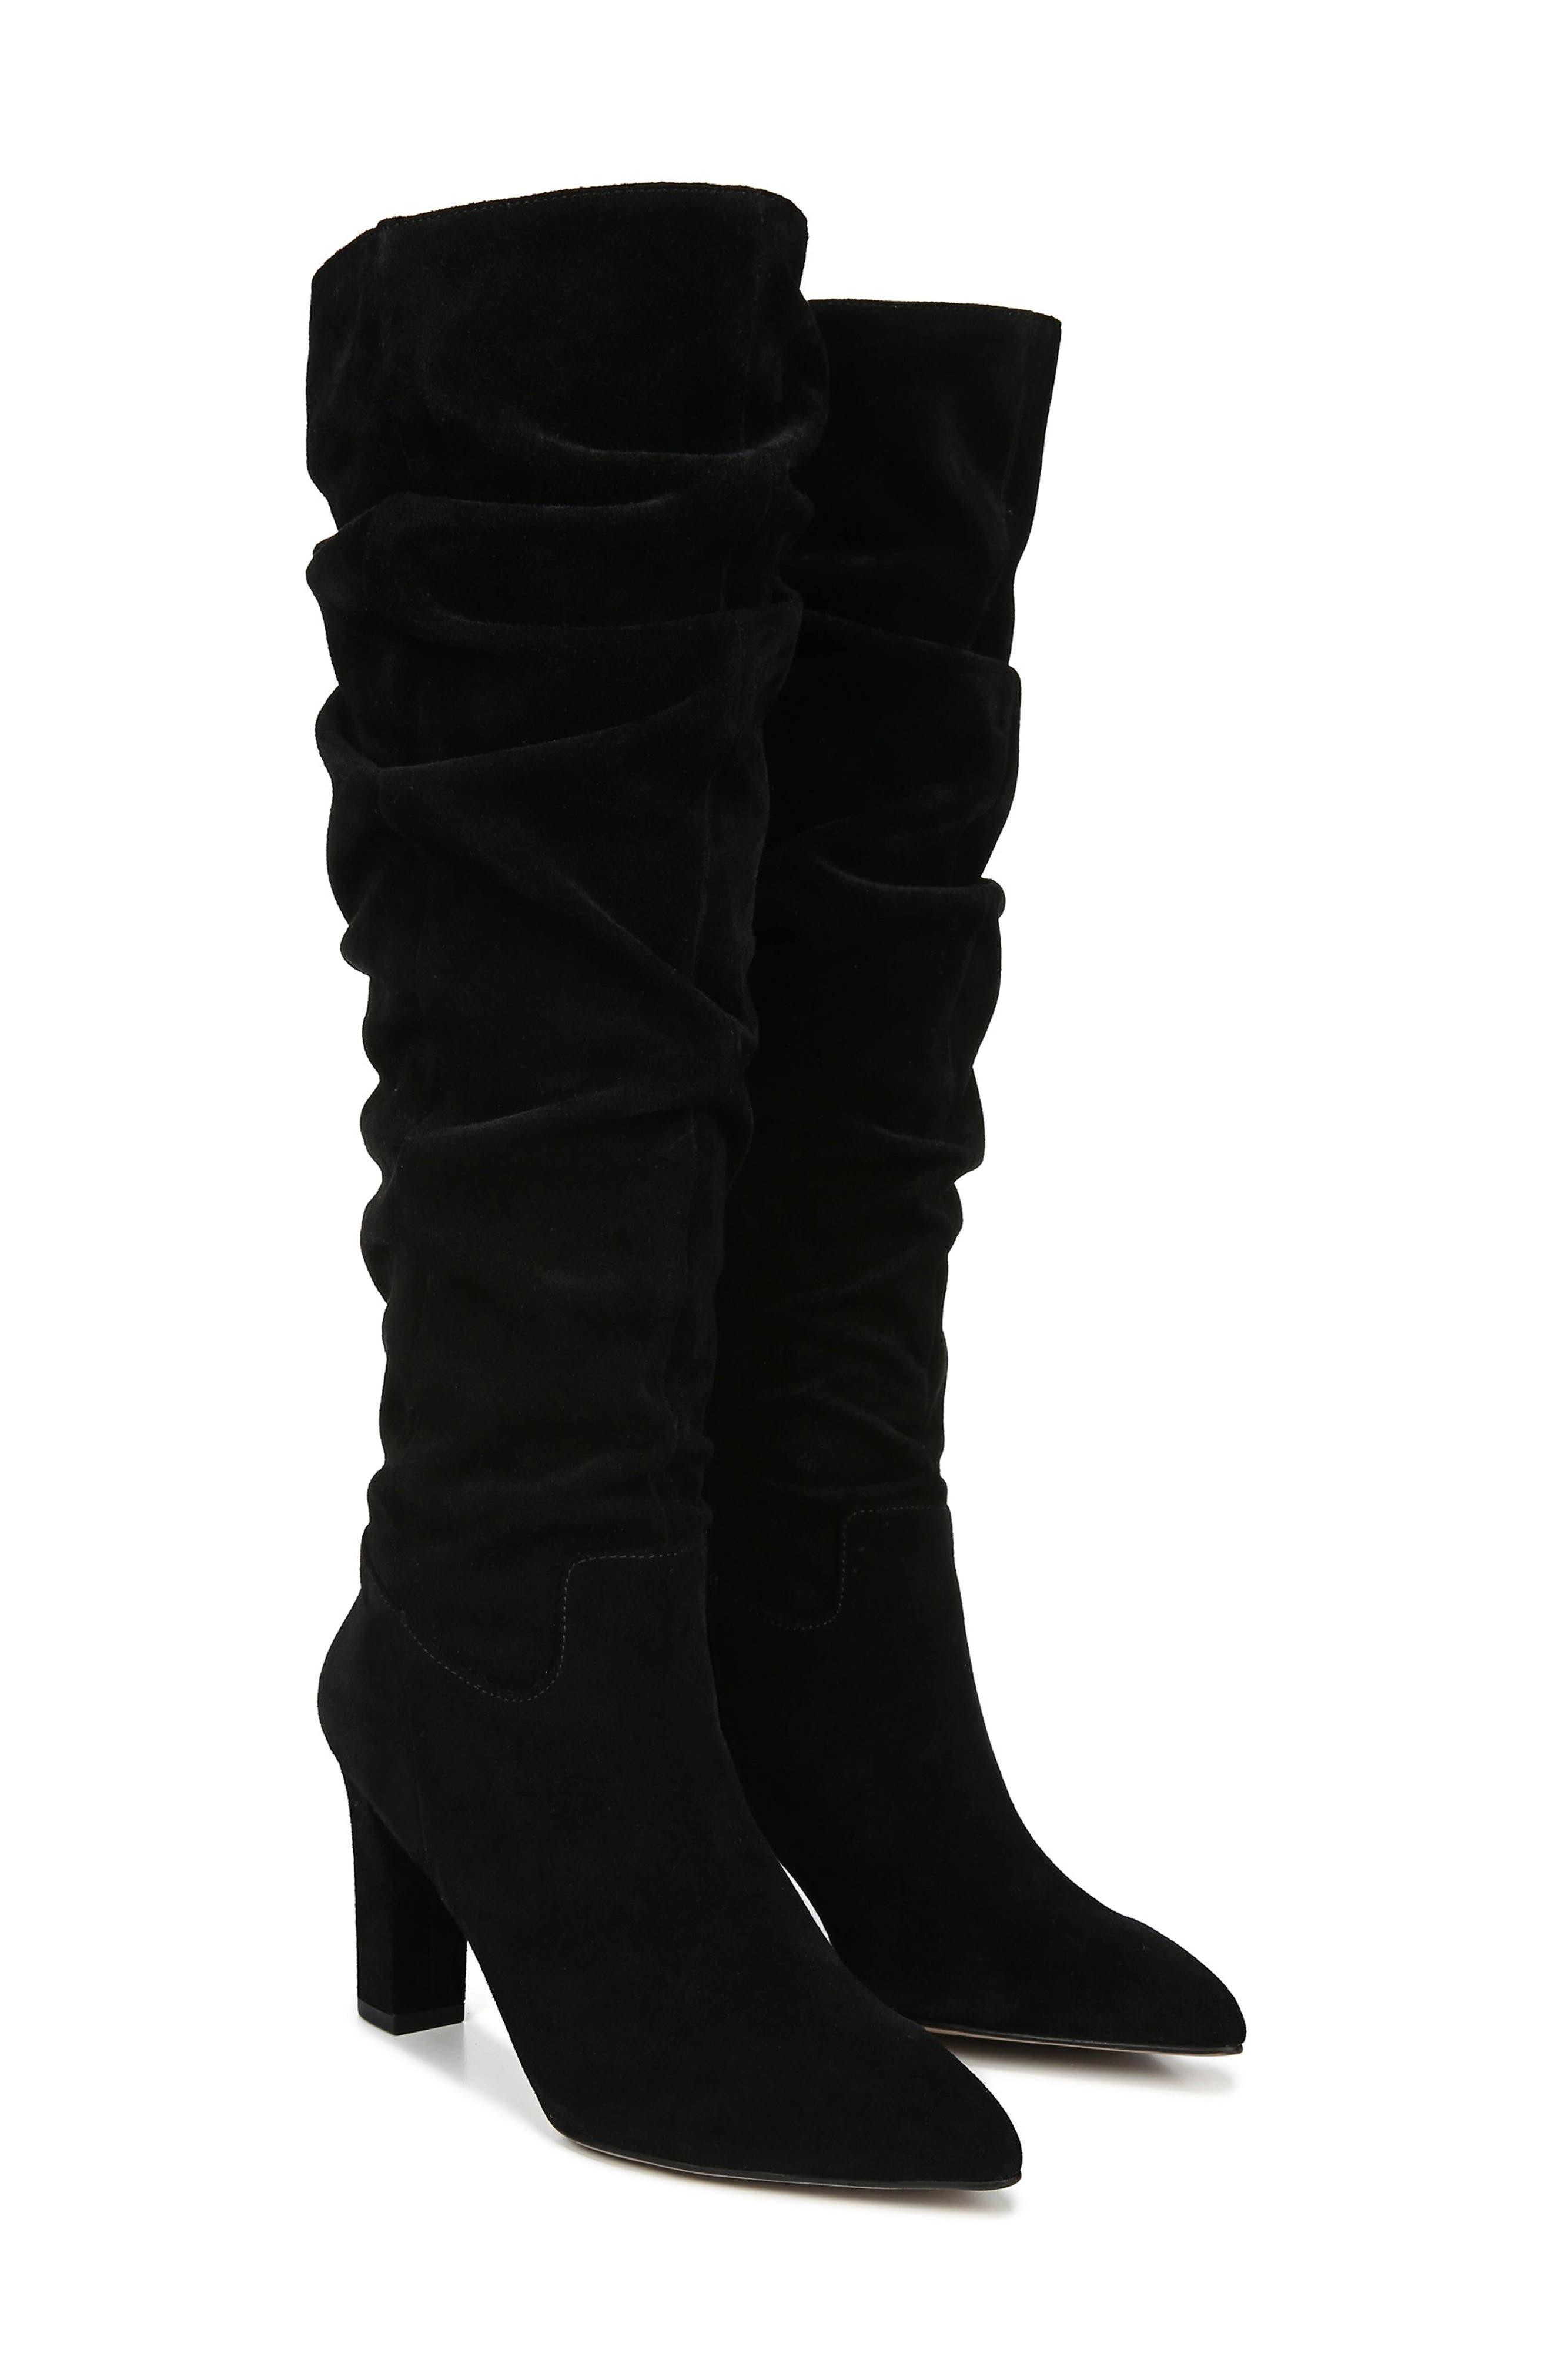 Artesia Knee High Boot,                             Alternate thumbnail 8, color,                             BLACK SUEDE